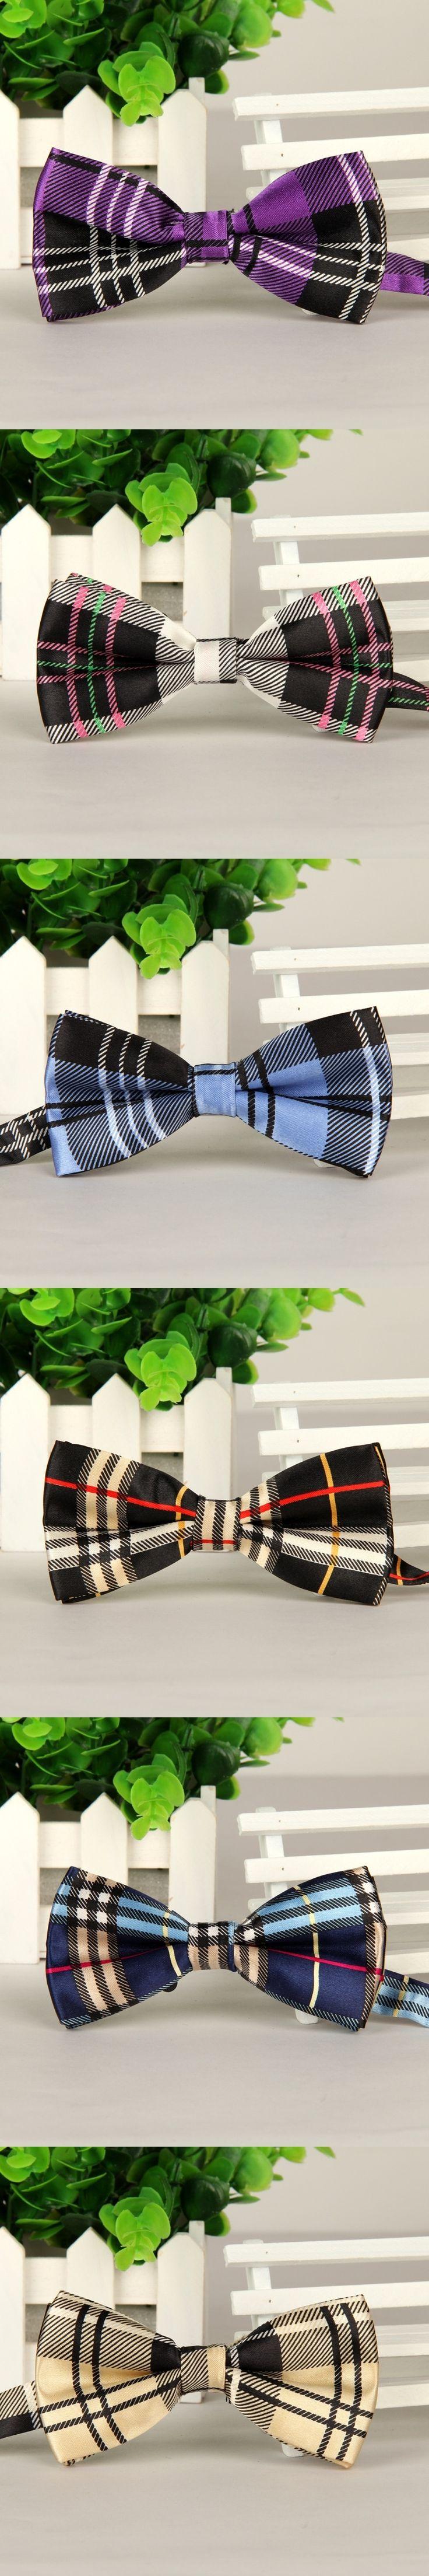 Fashion British Style Plaid Bowties Groom Men Gird Cravat gravata Male Marriage Butterfly Wedding Bow ties